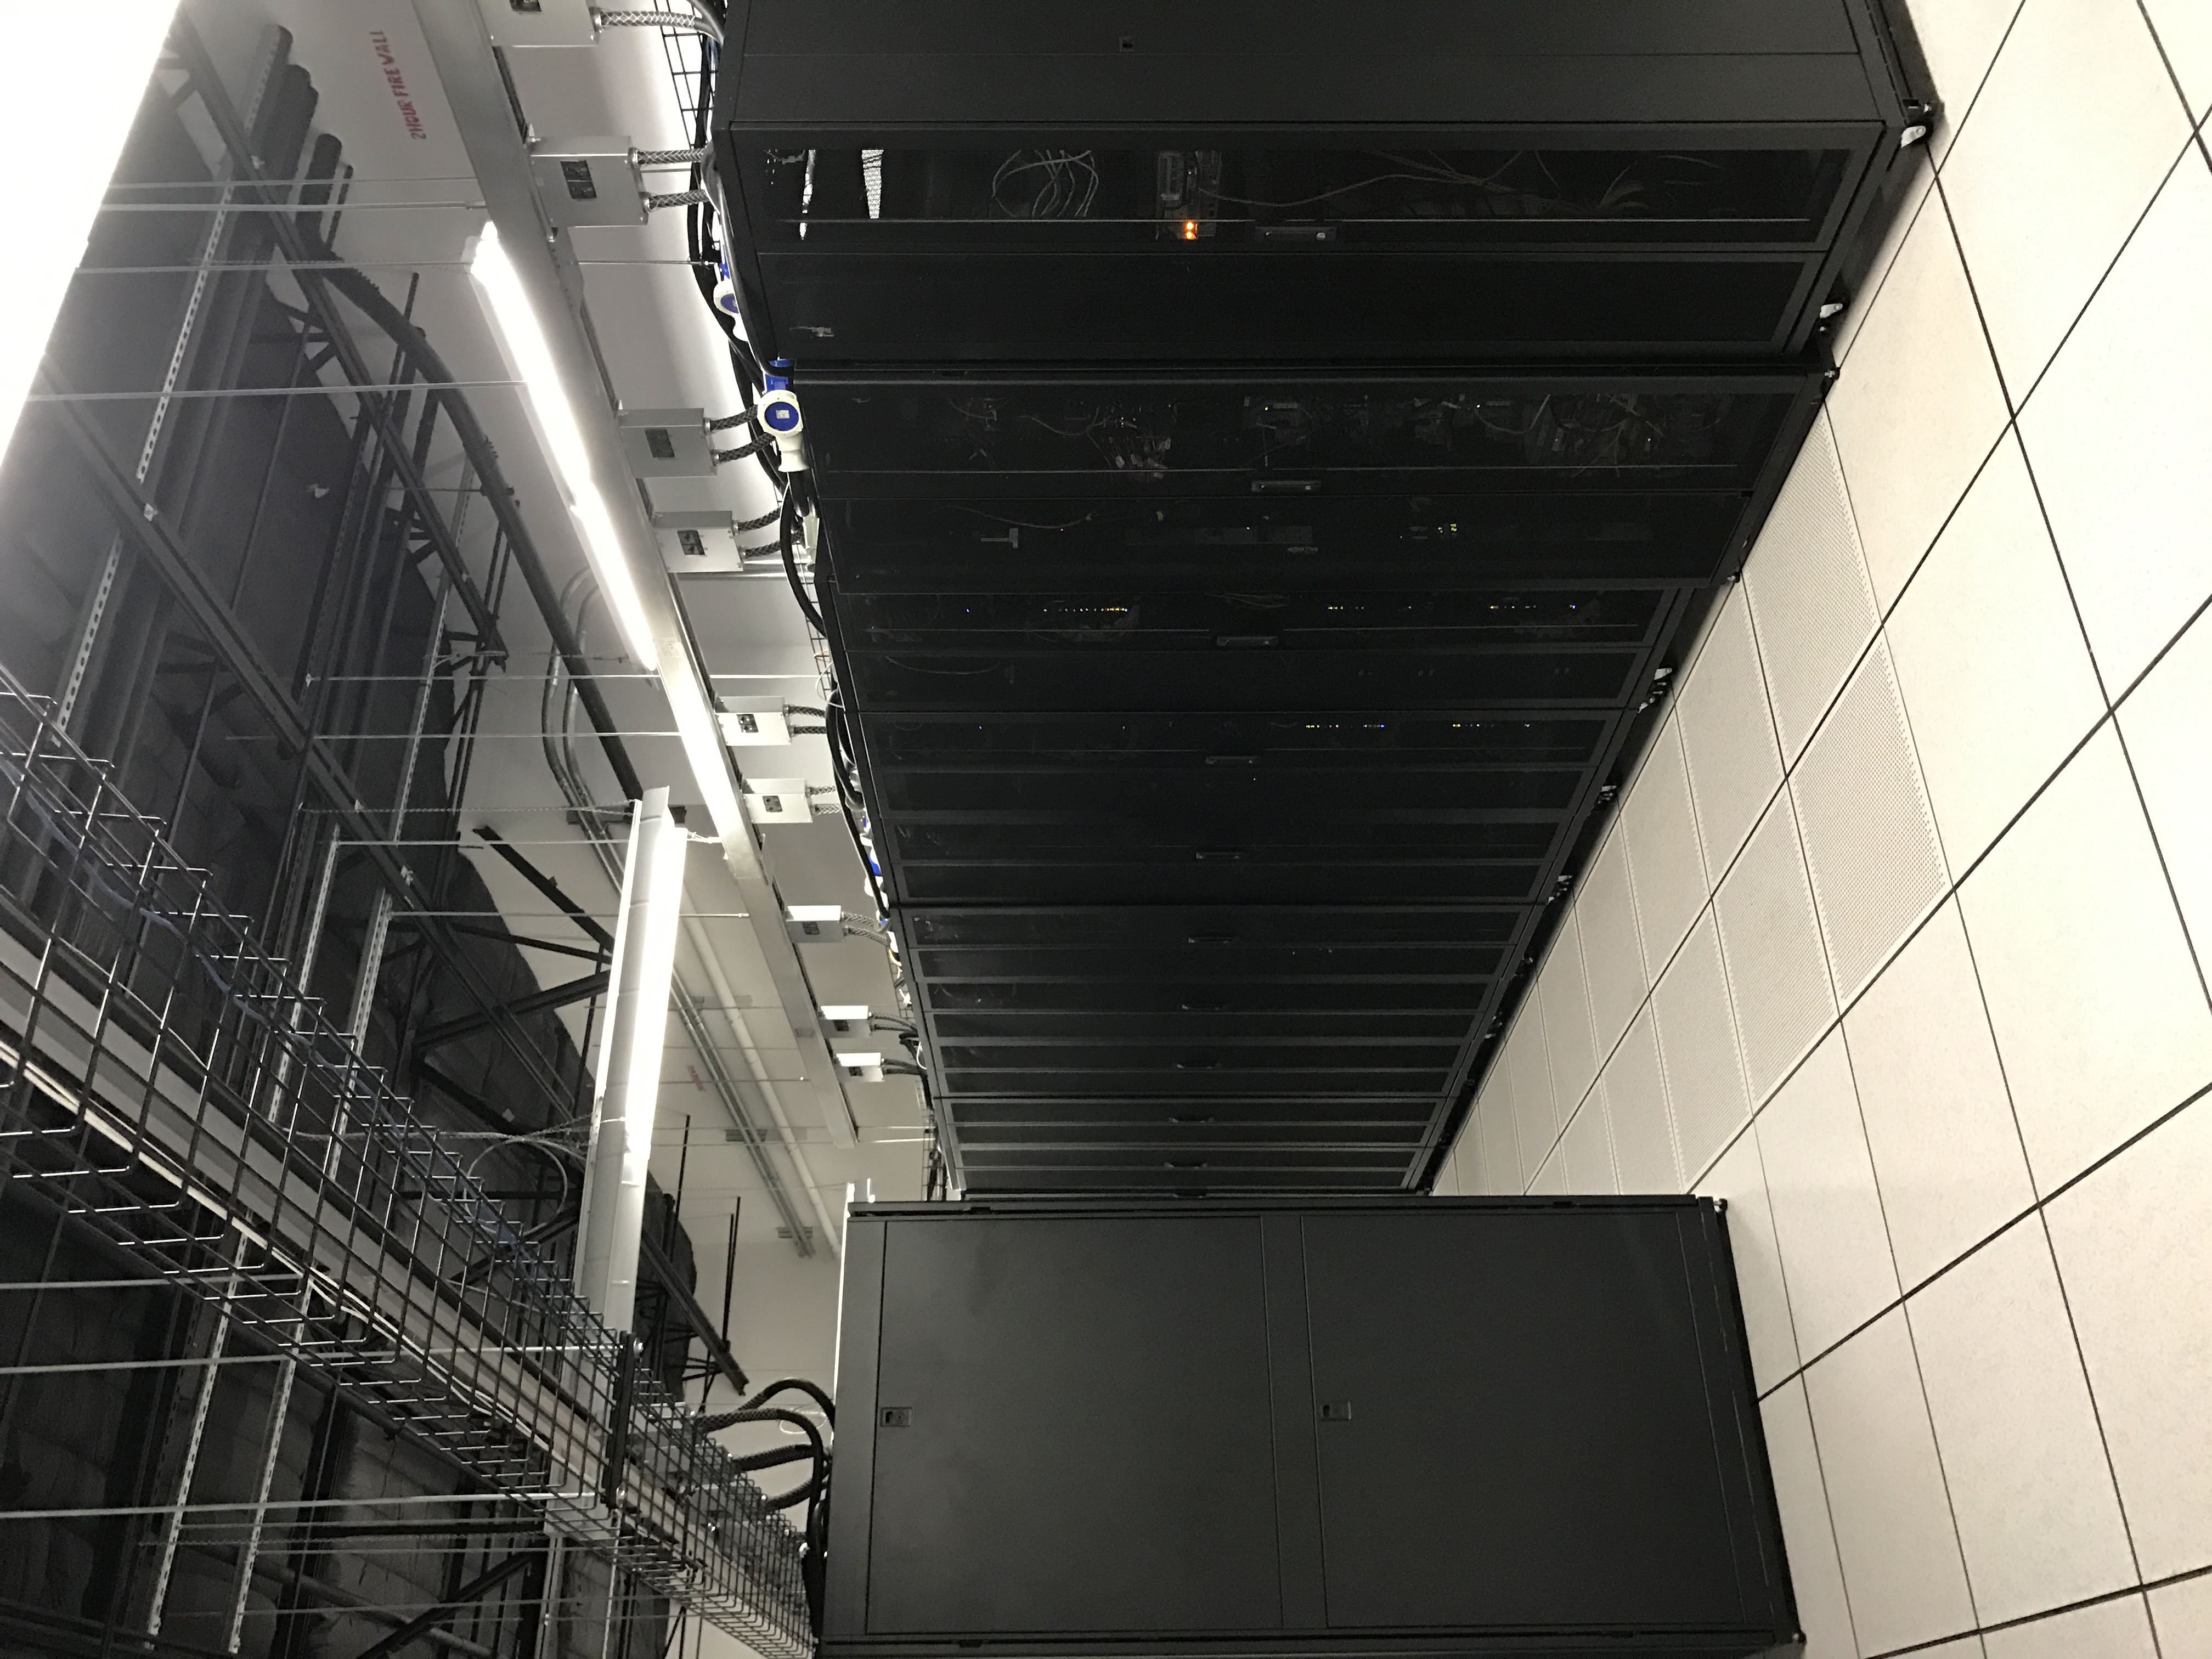 Data Center view 1